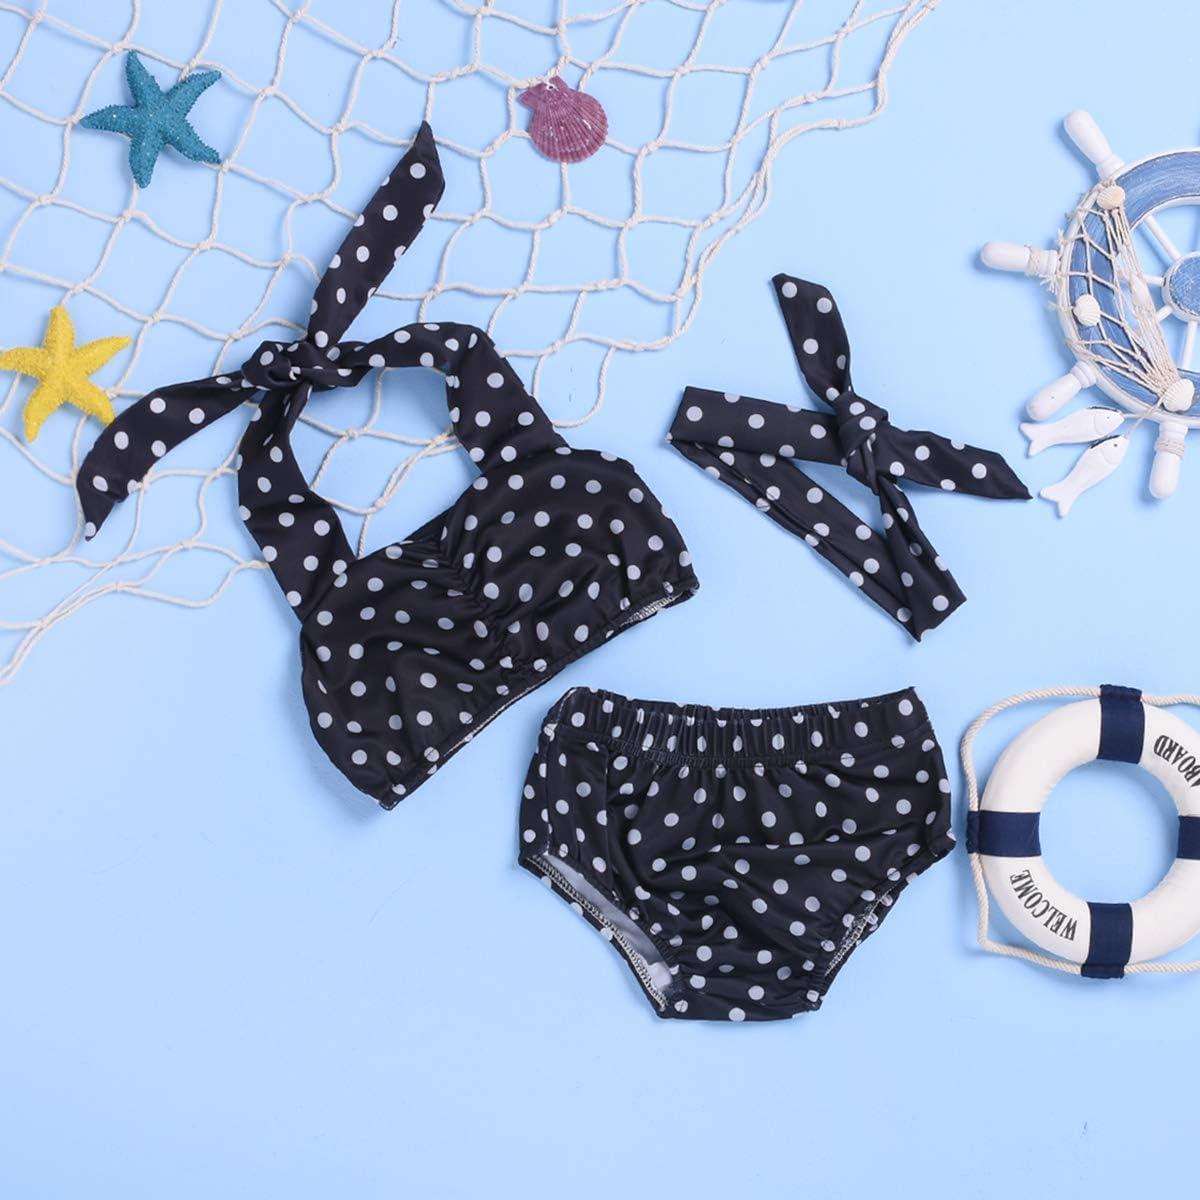 Girls Kids Polka Dots Swimwear Swimming Costume Swimsuit Bikini Age 2-14 Years